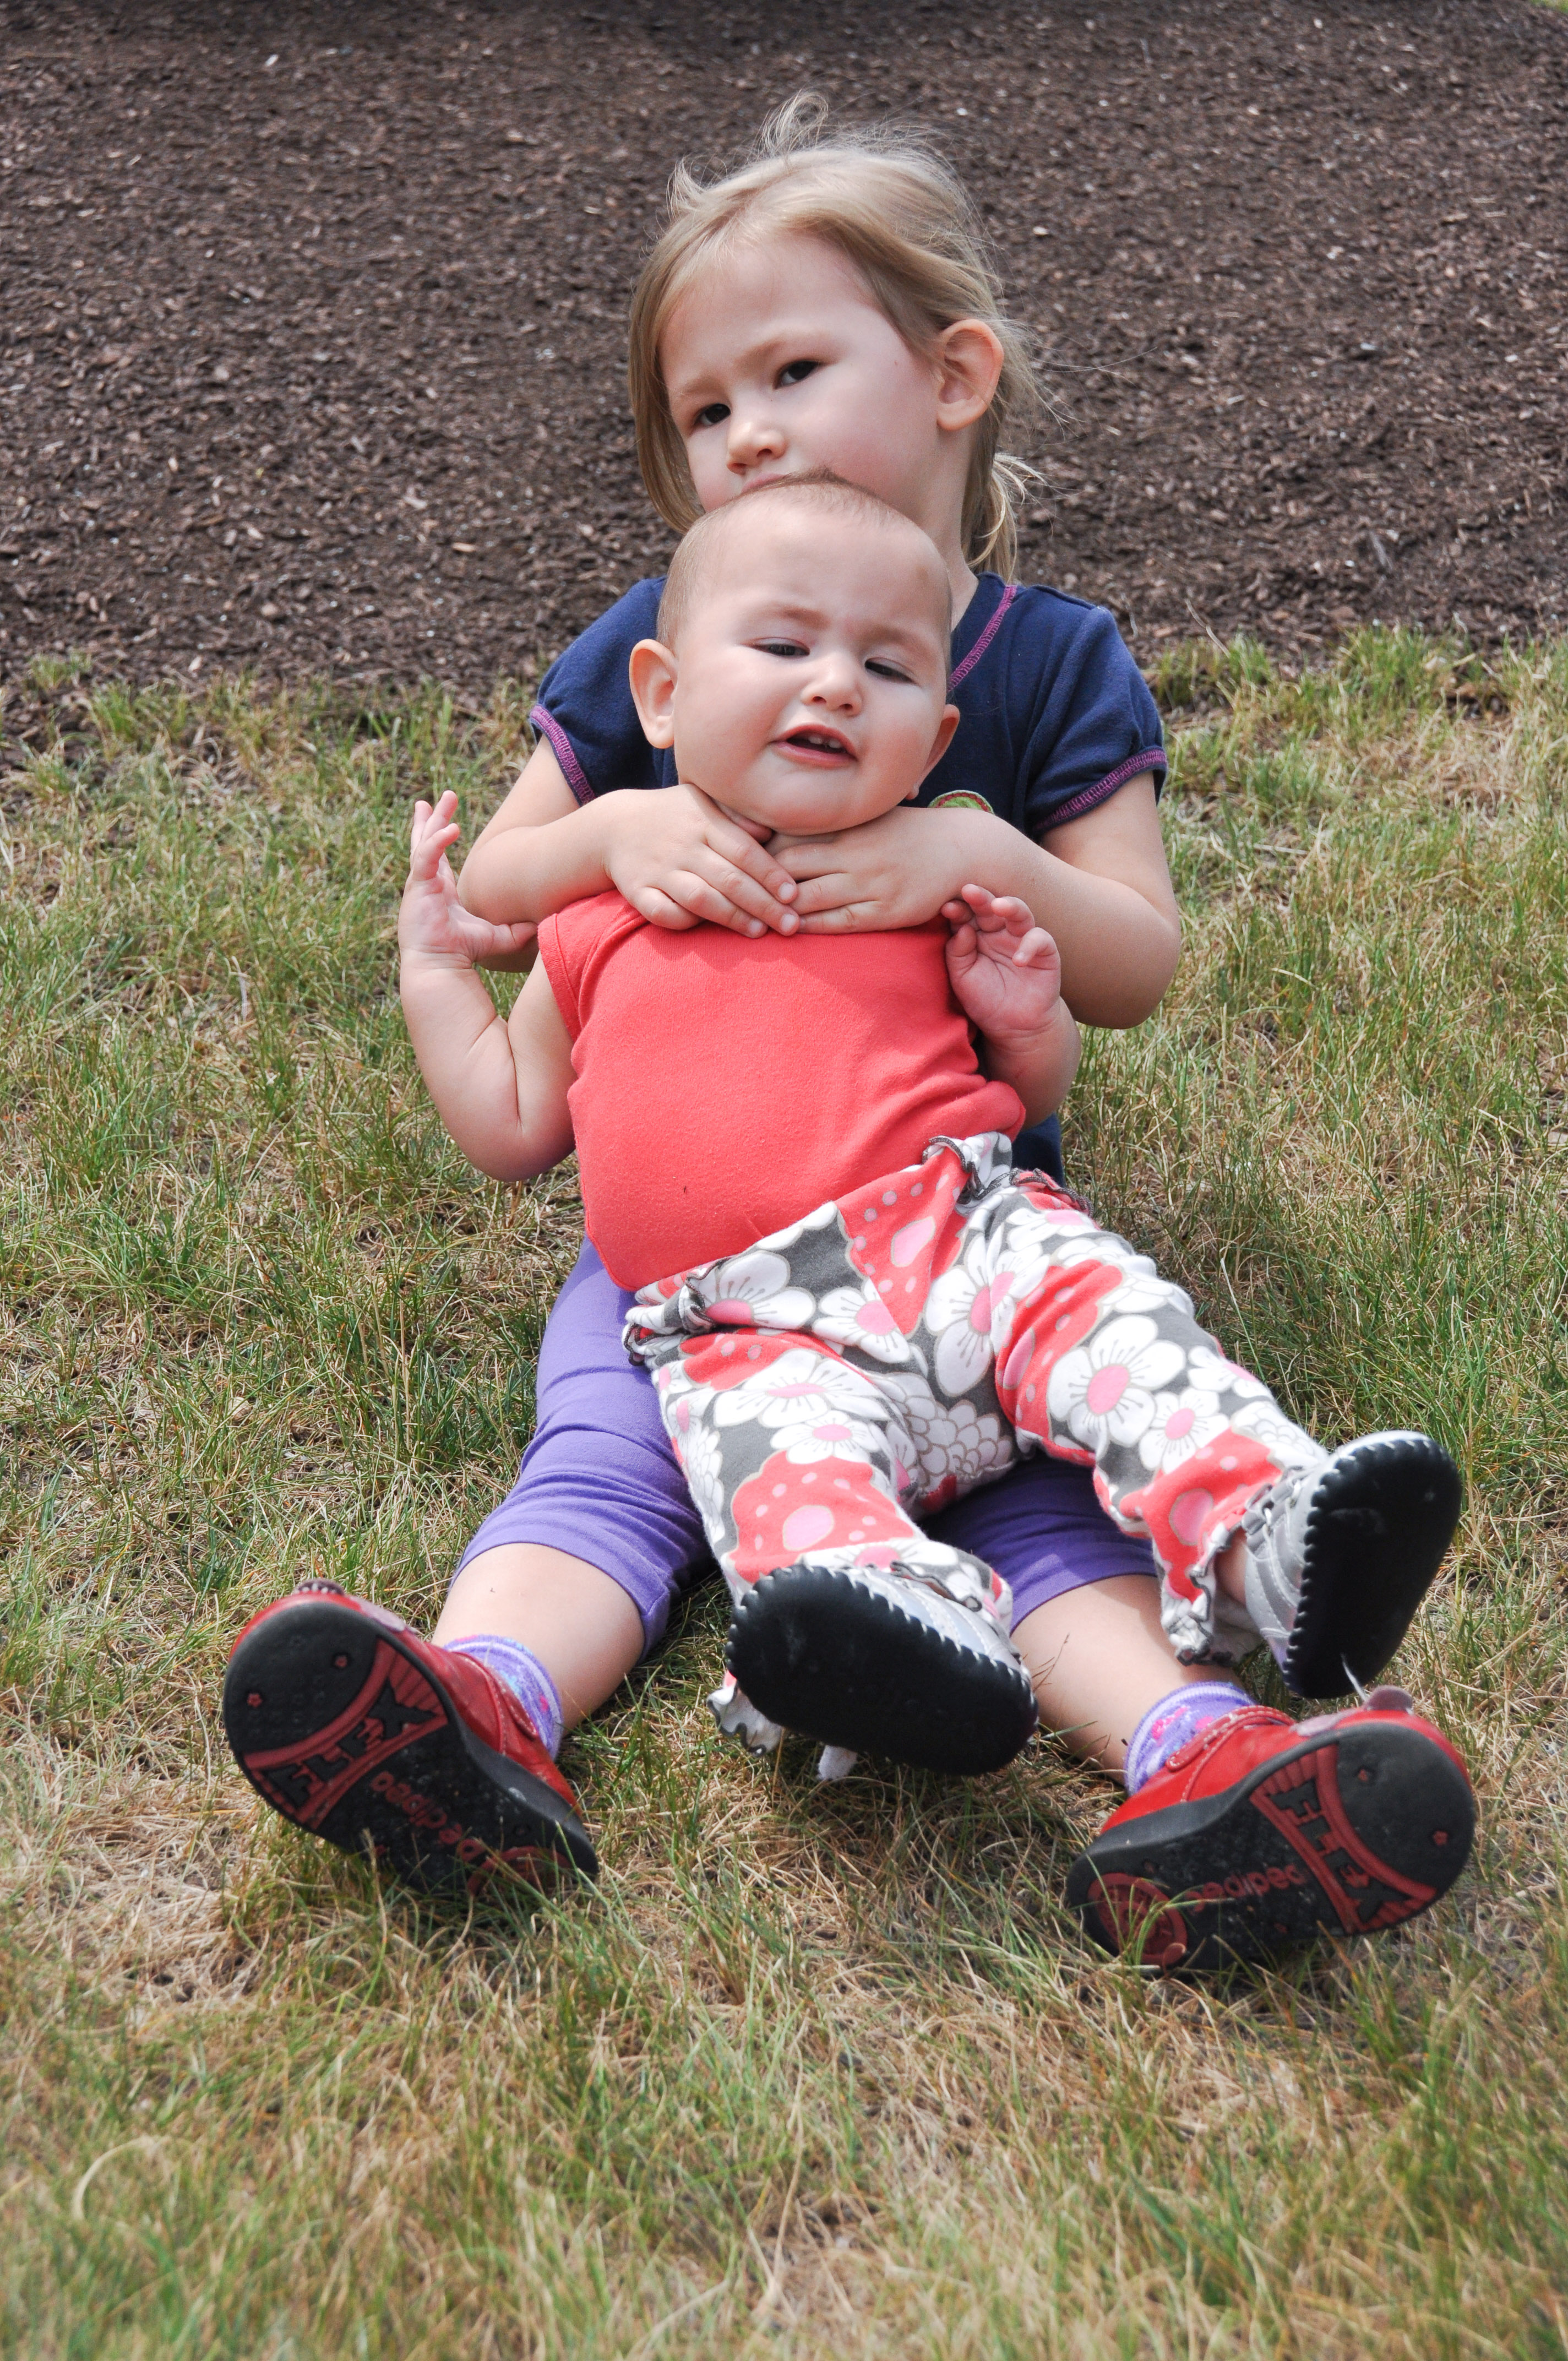 Josie and Celia on the grass